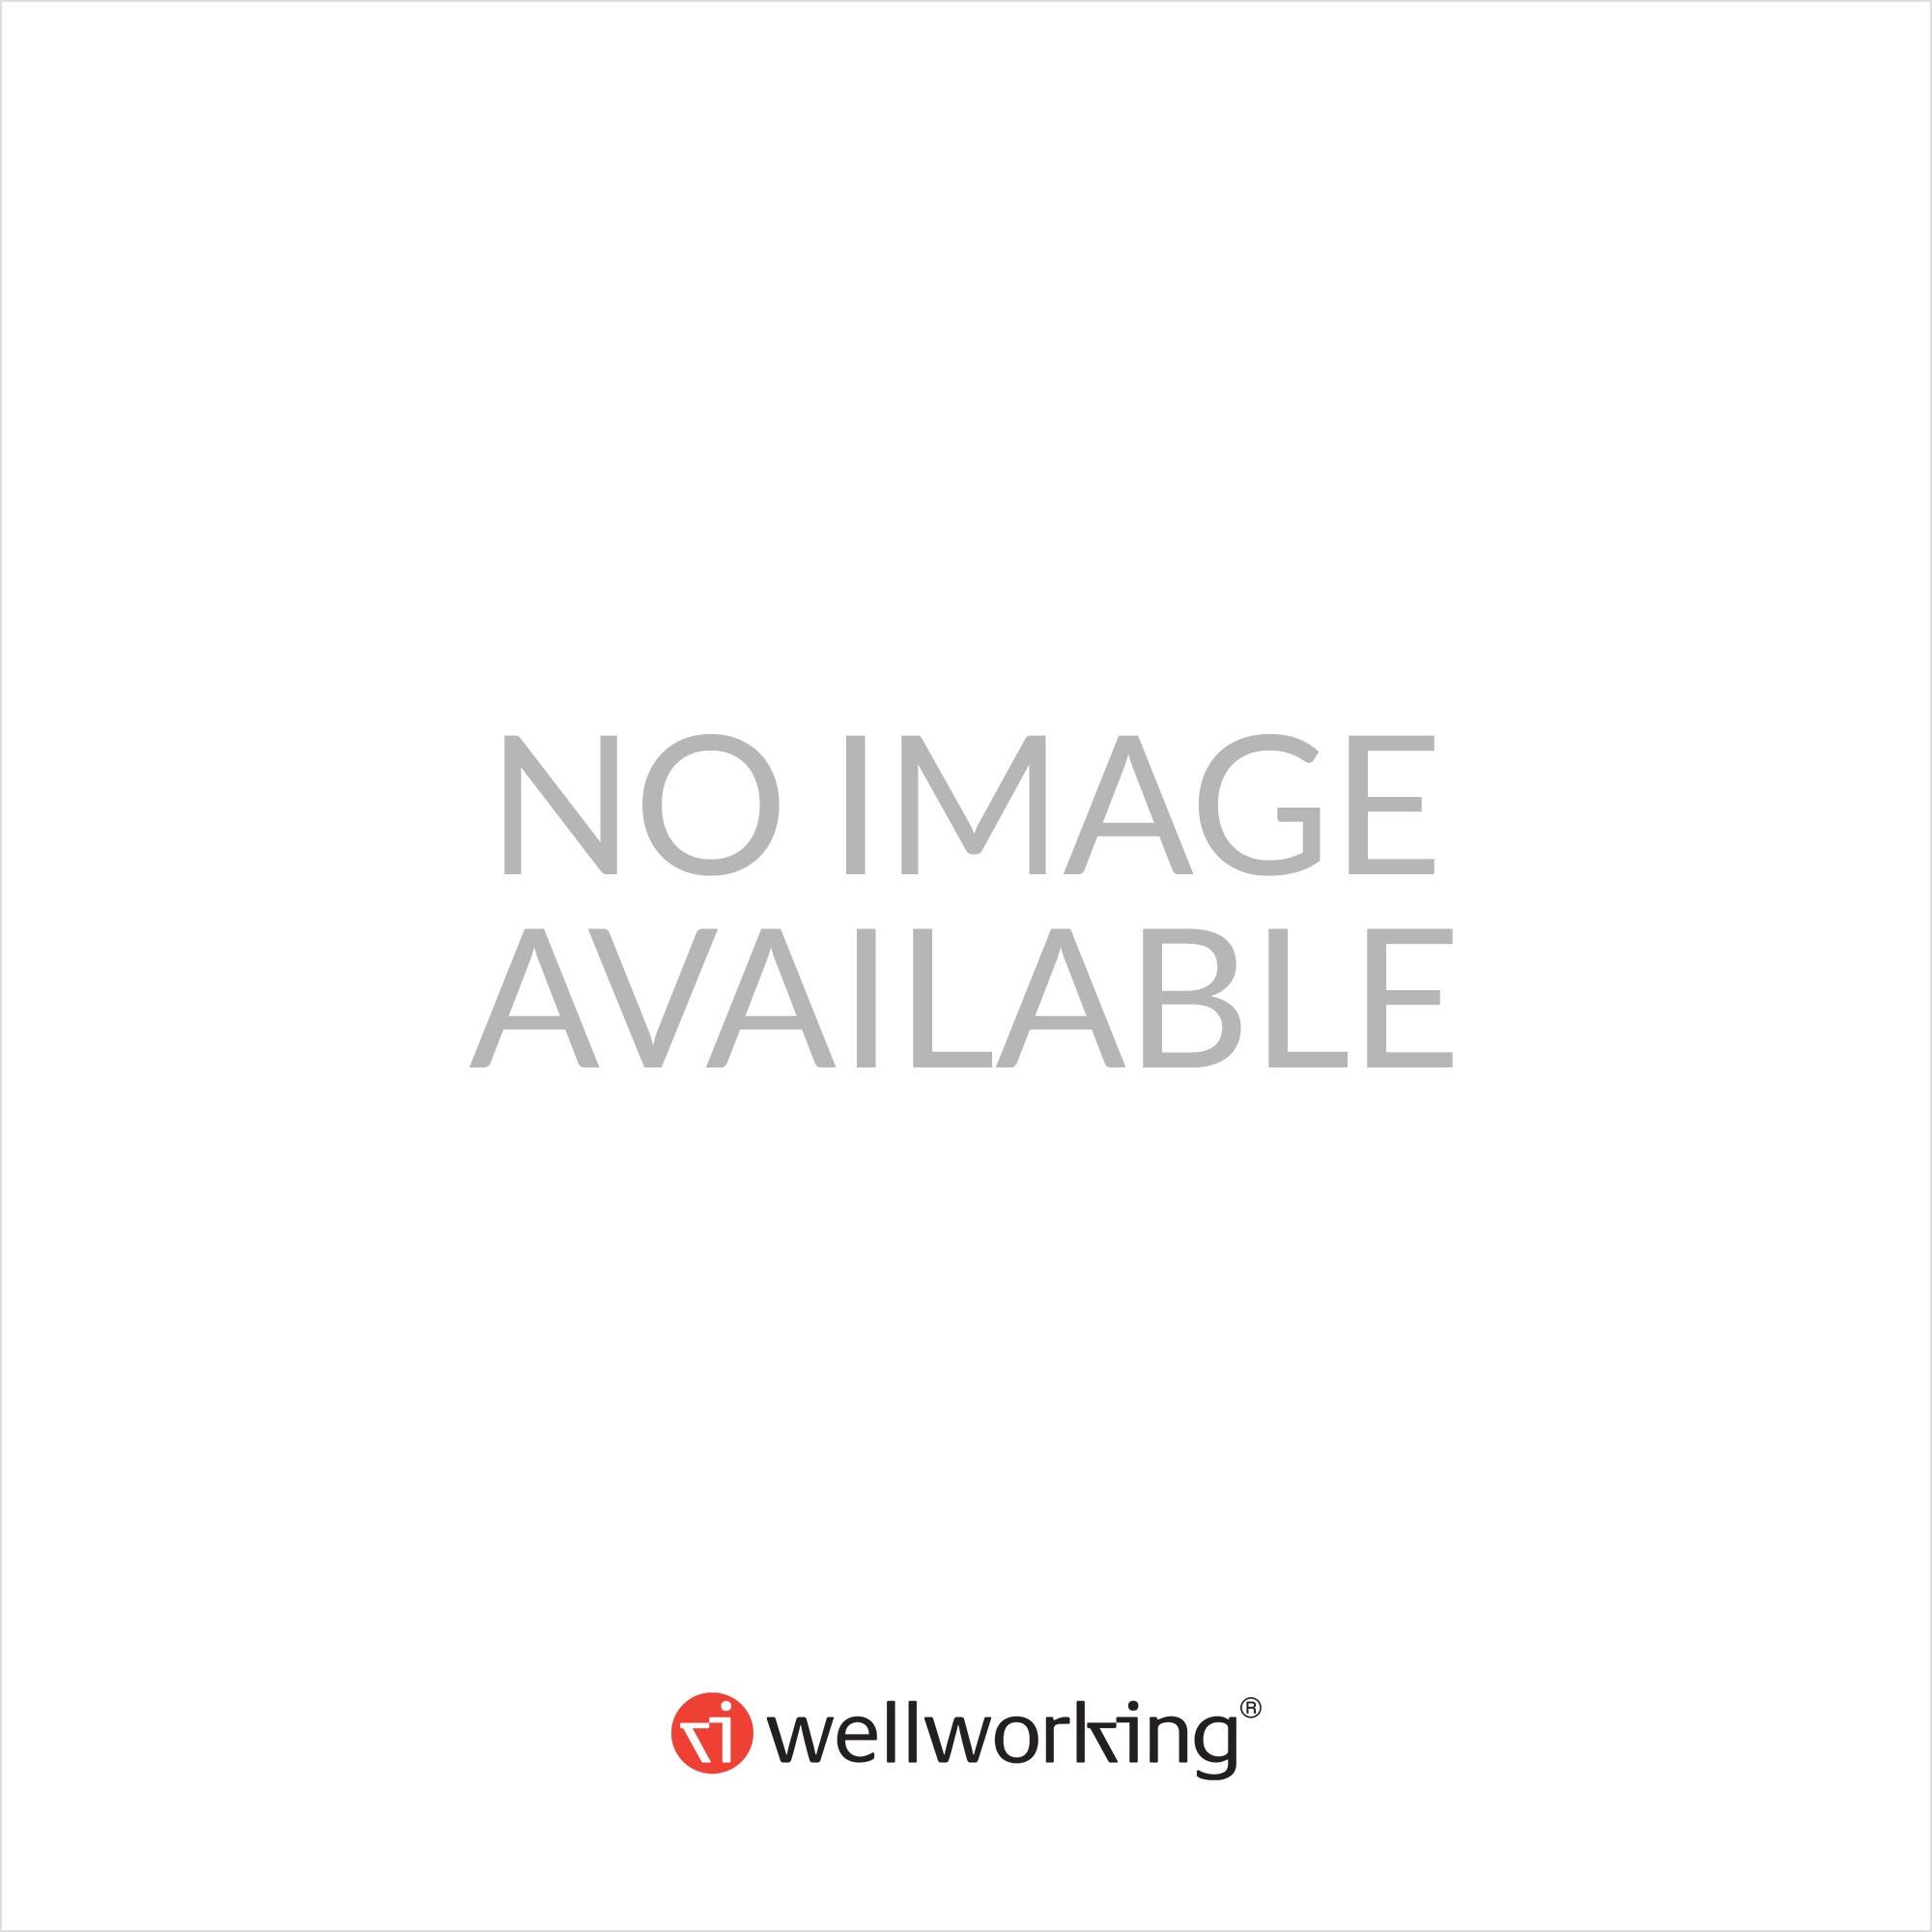 herma miller mirra 2 triflex chair. Black Bedroom Furniture Sets. Home Design Ideas